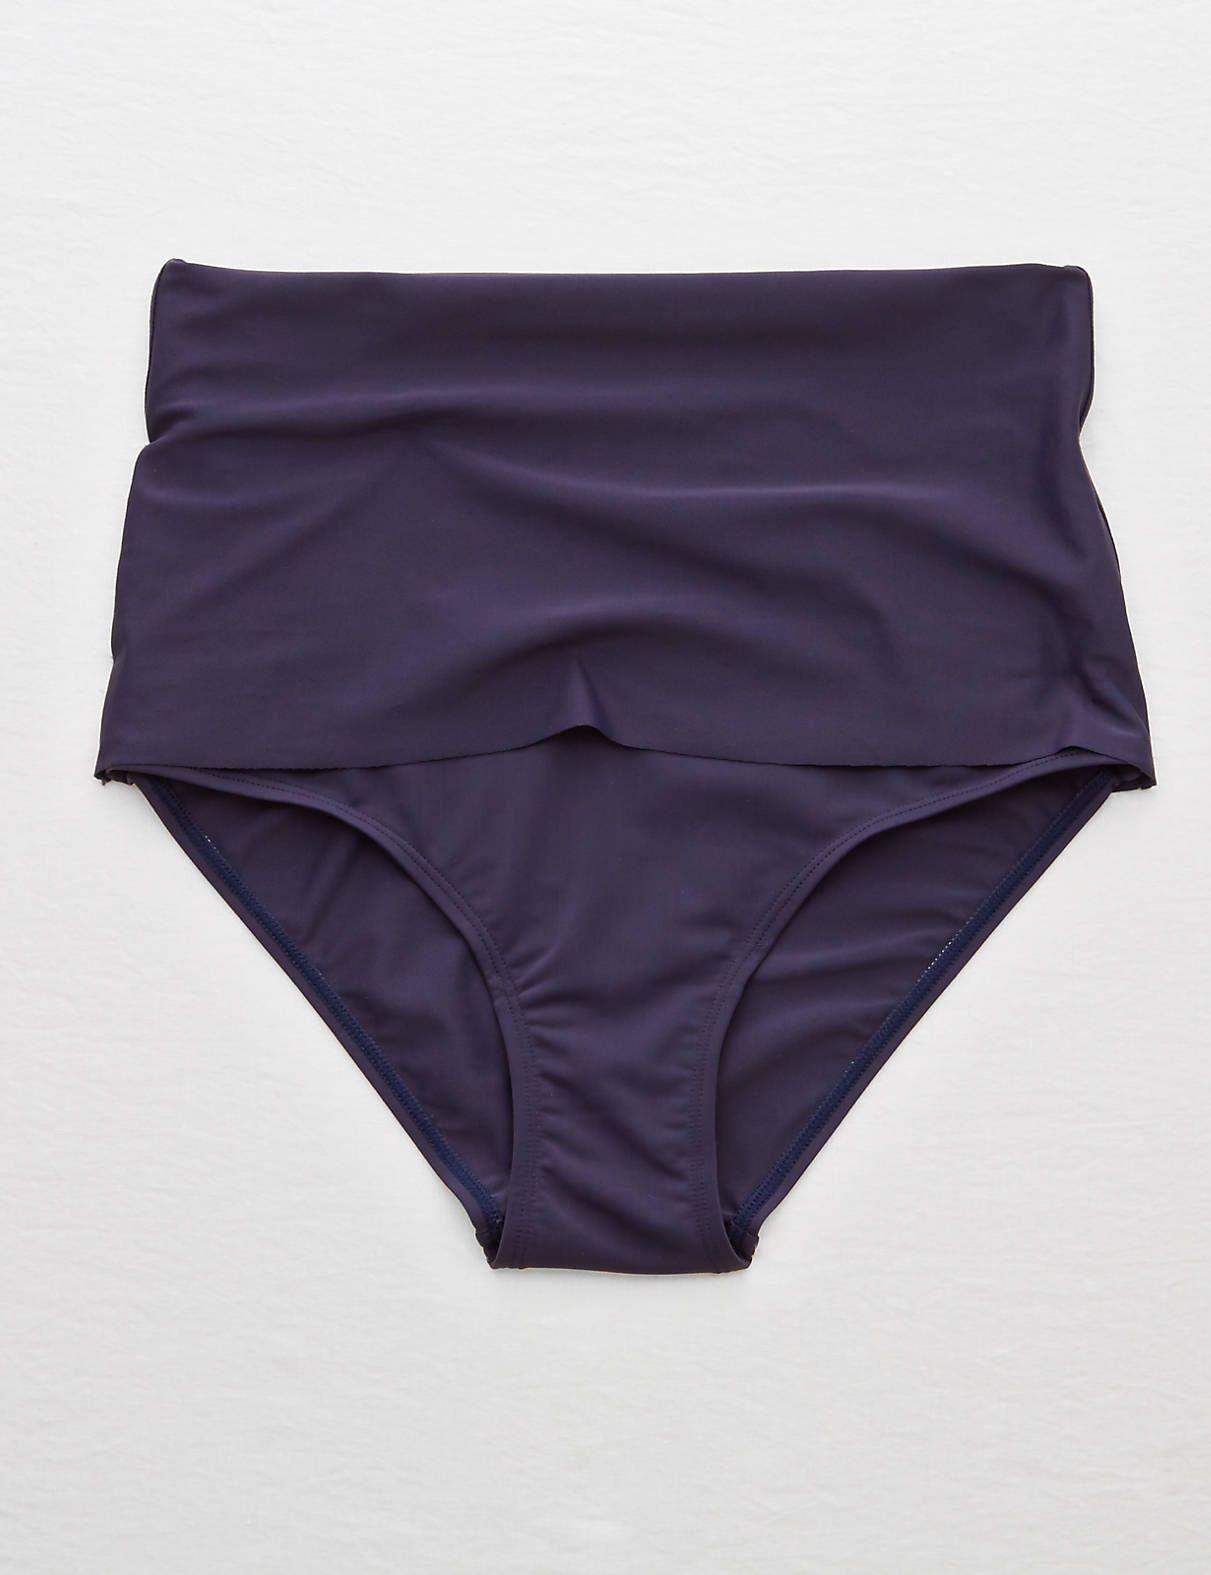 54efb202bffb9 Aerie Hi-Rise Foldover Bikini Bottom , Navy | Aerie for American Eagle